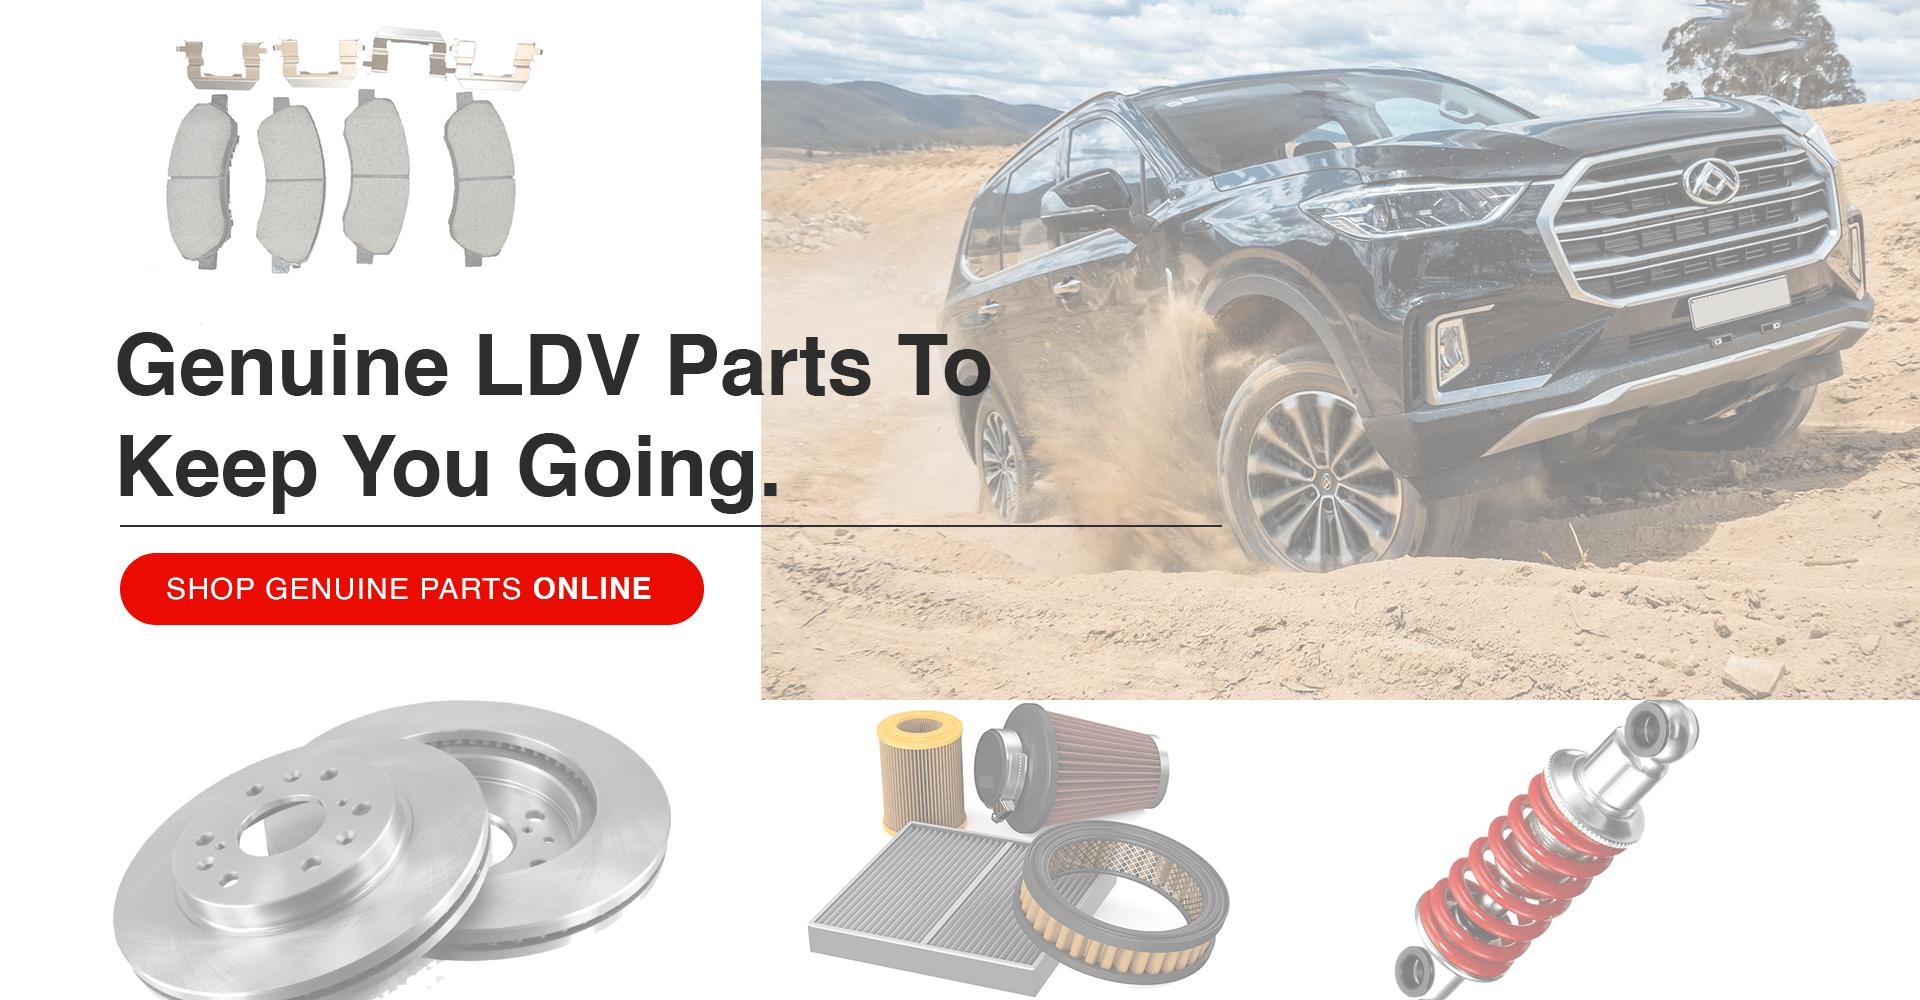 LDV_Genuine_Parts